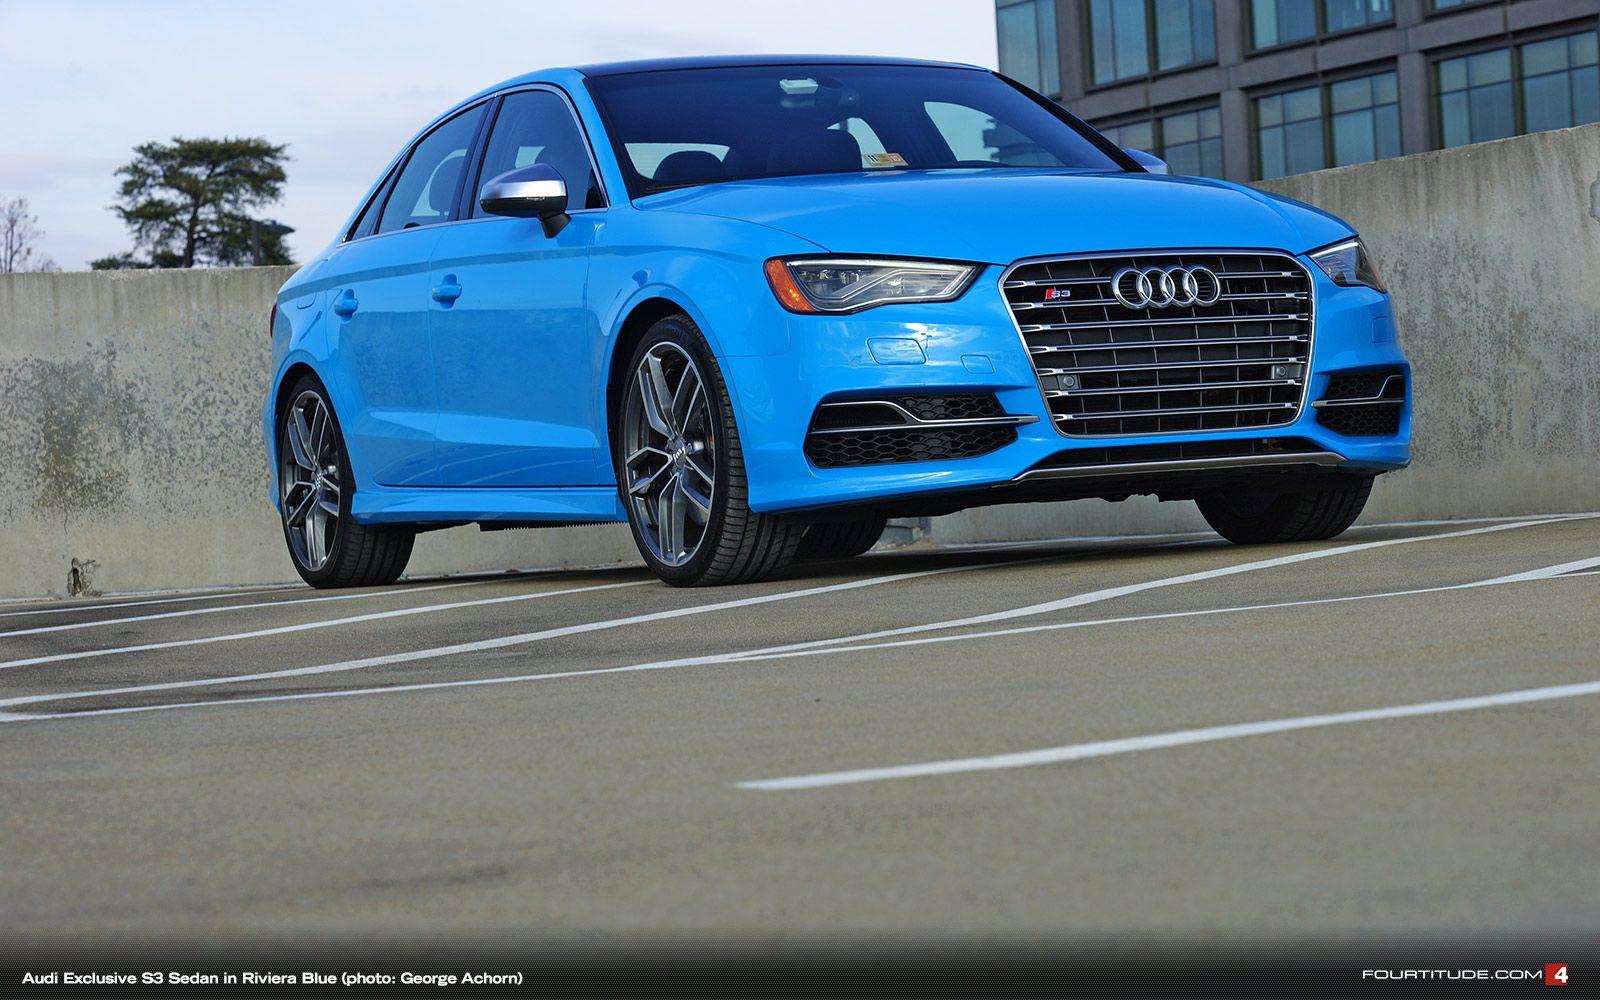 Audi Exclusive S3 Sedan in Eye-Searing Riviera Blue – Fourtitude.com